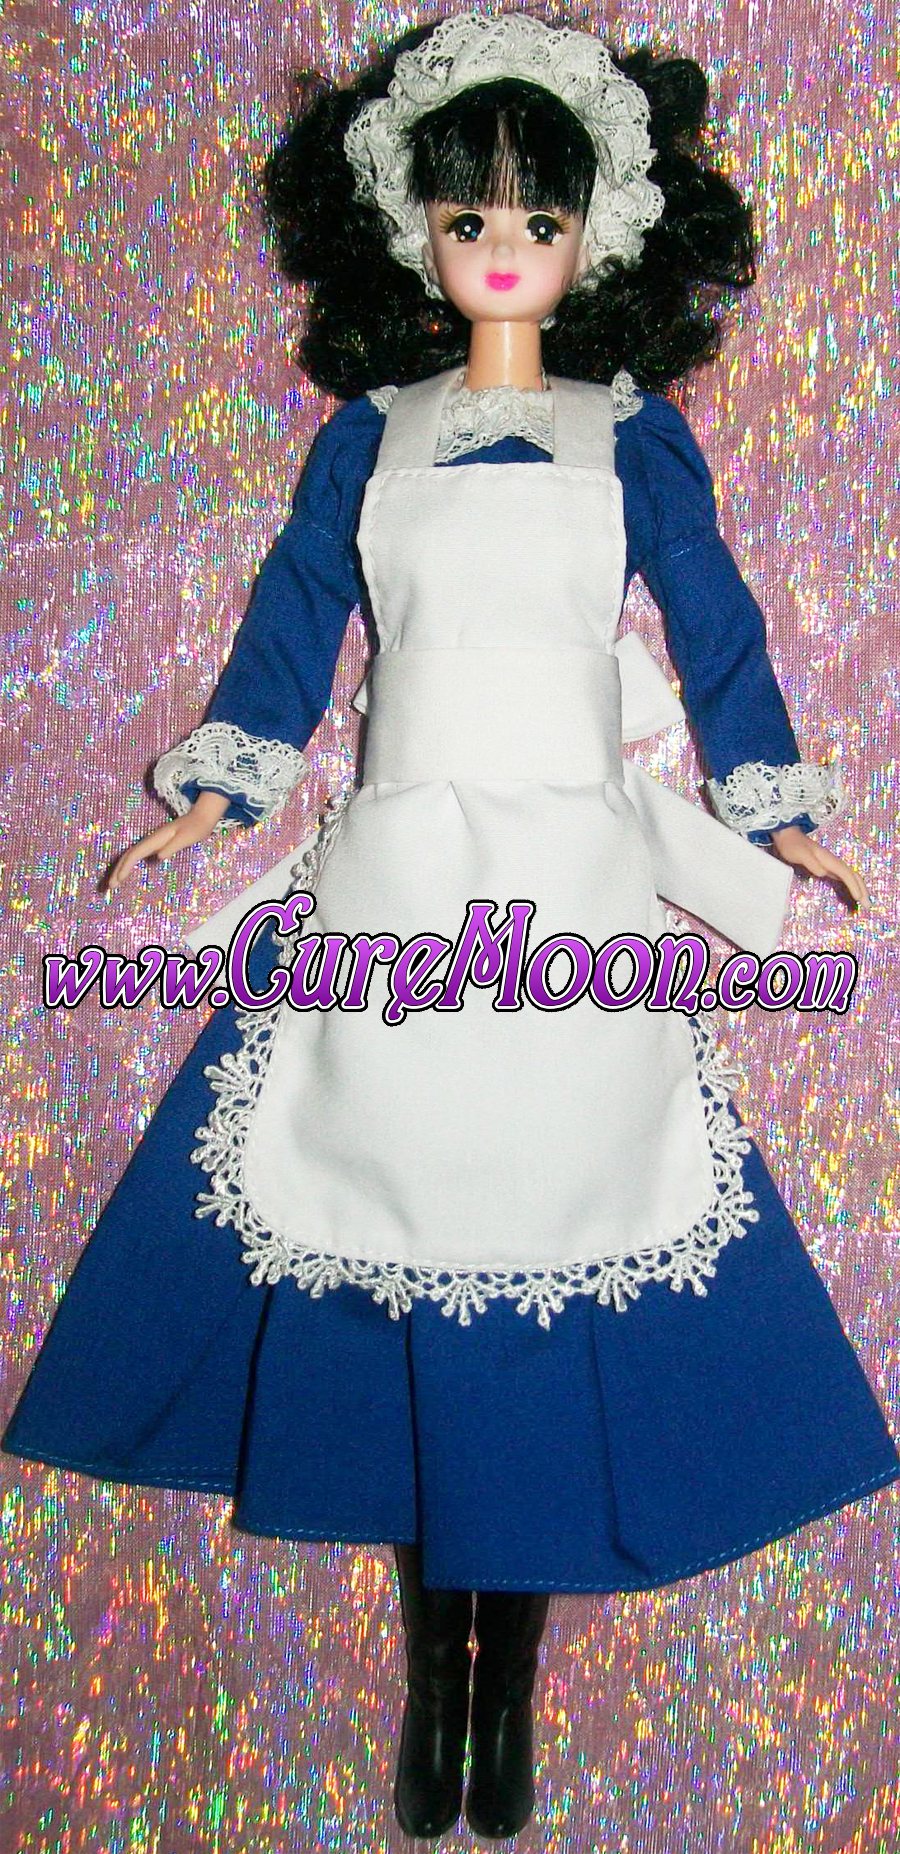 ranmaru-mademoiselle-anne-custom-doll-bambola-curemoon-bunnytsukino